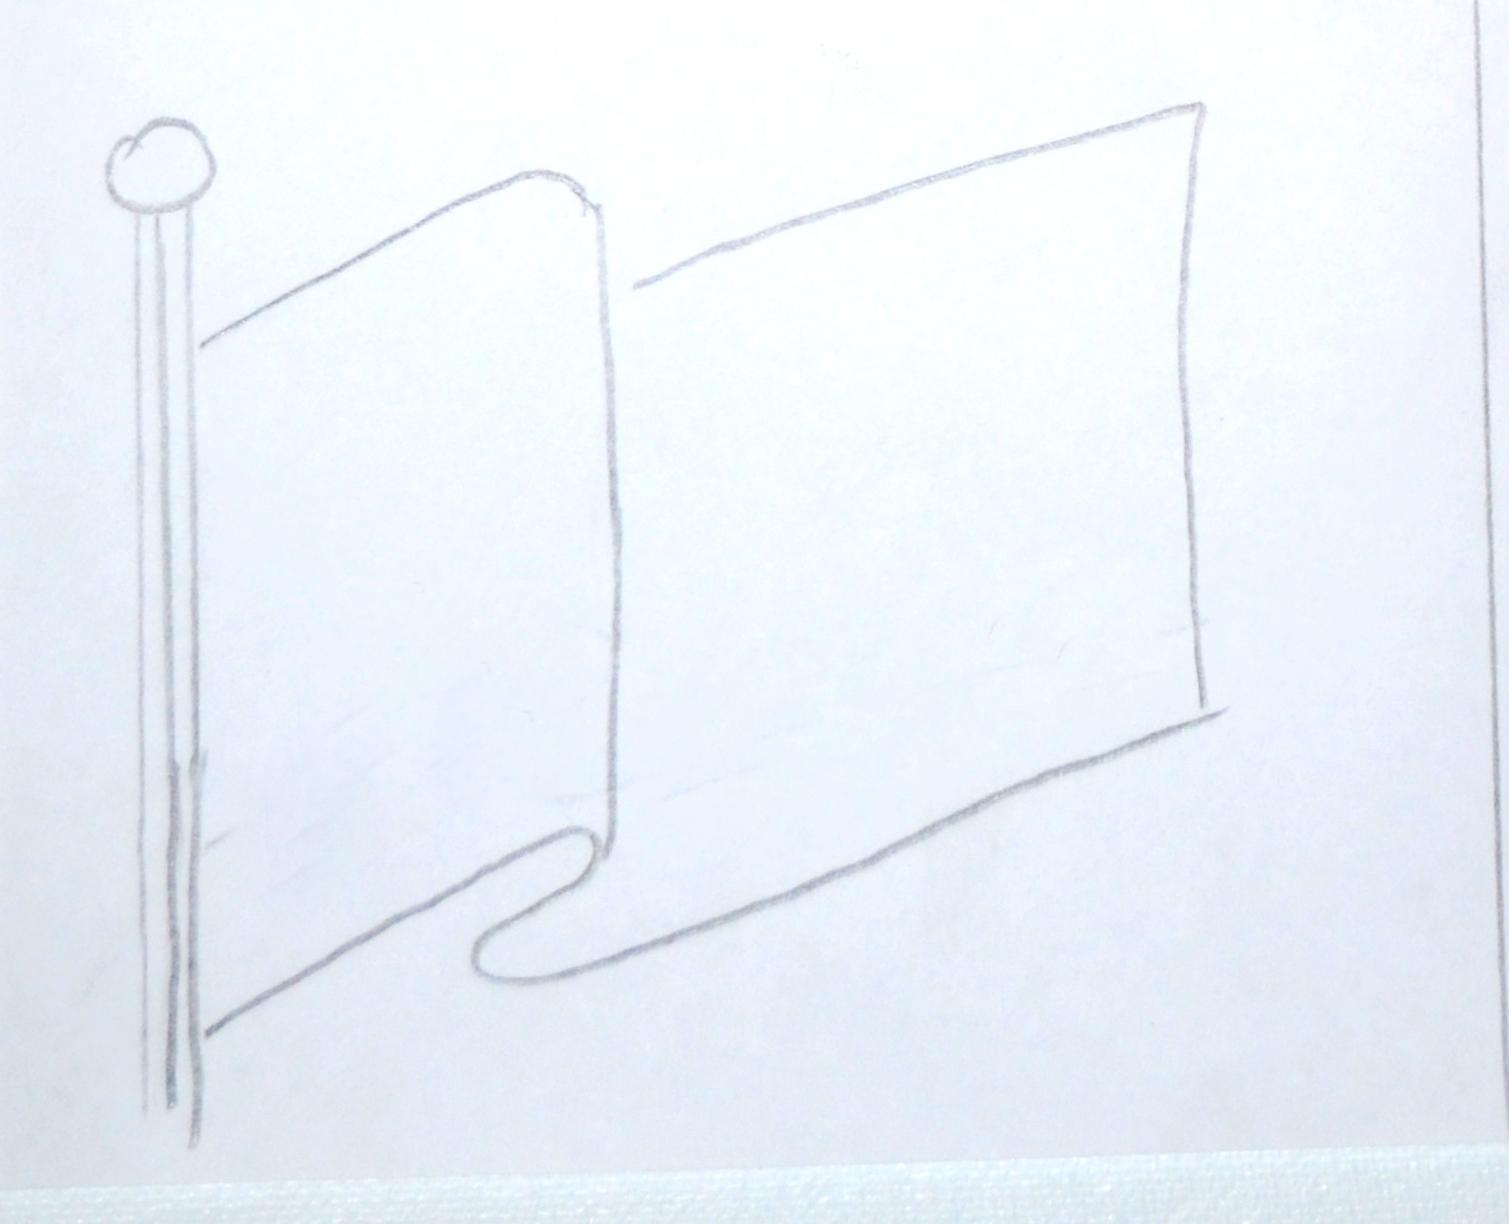 Line Drawing Jellyfish : Hand drawn jellyfish vector illustration watercolor stock